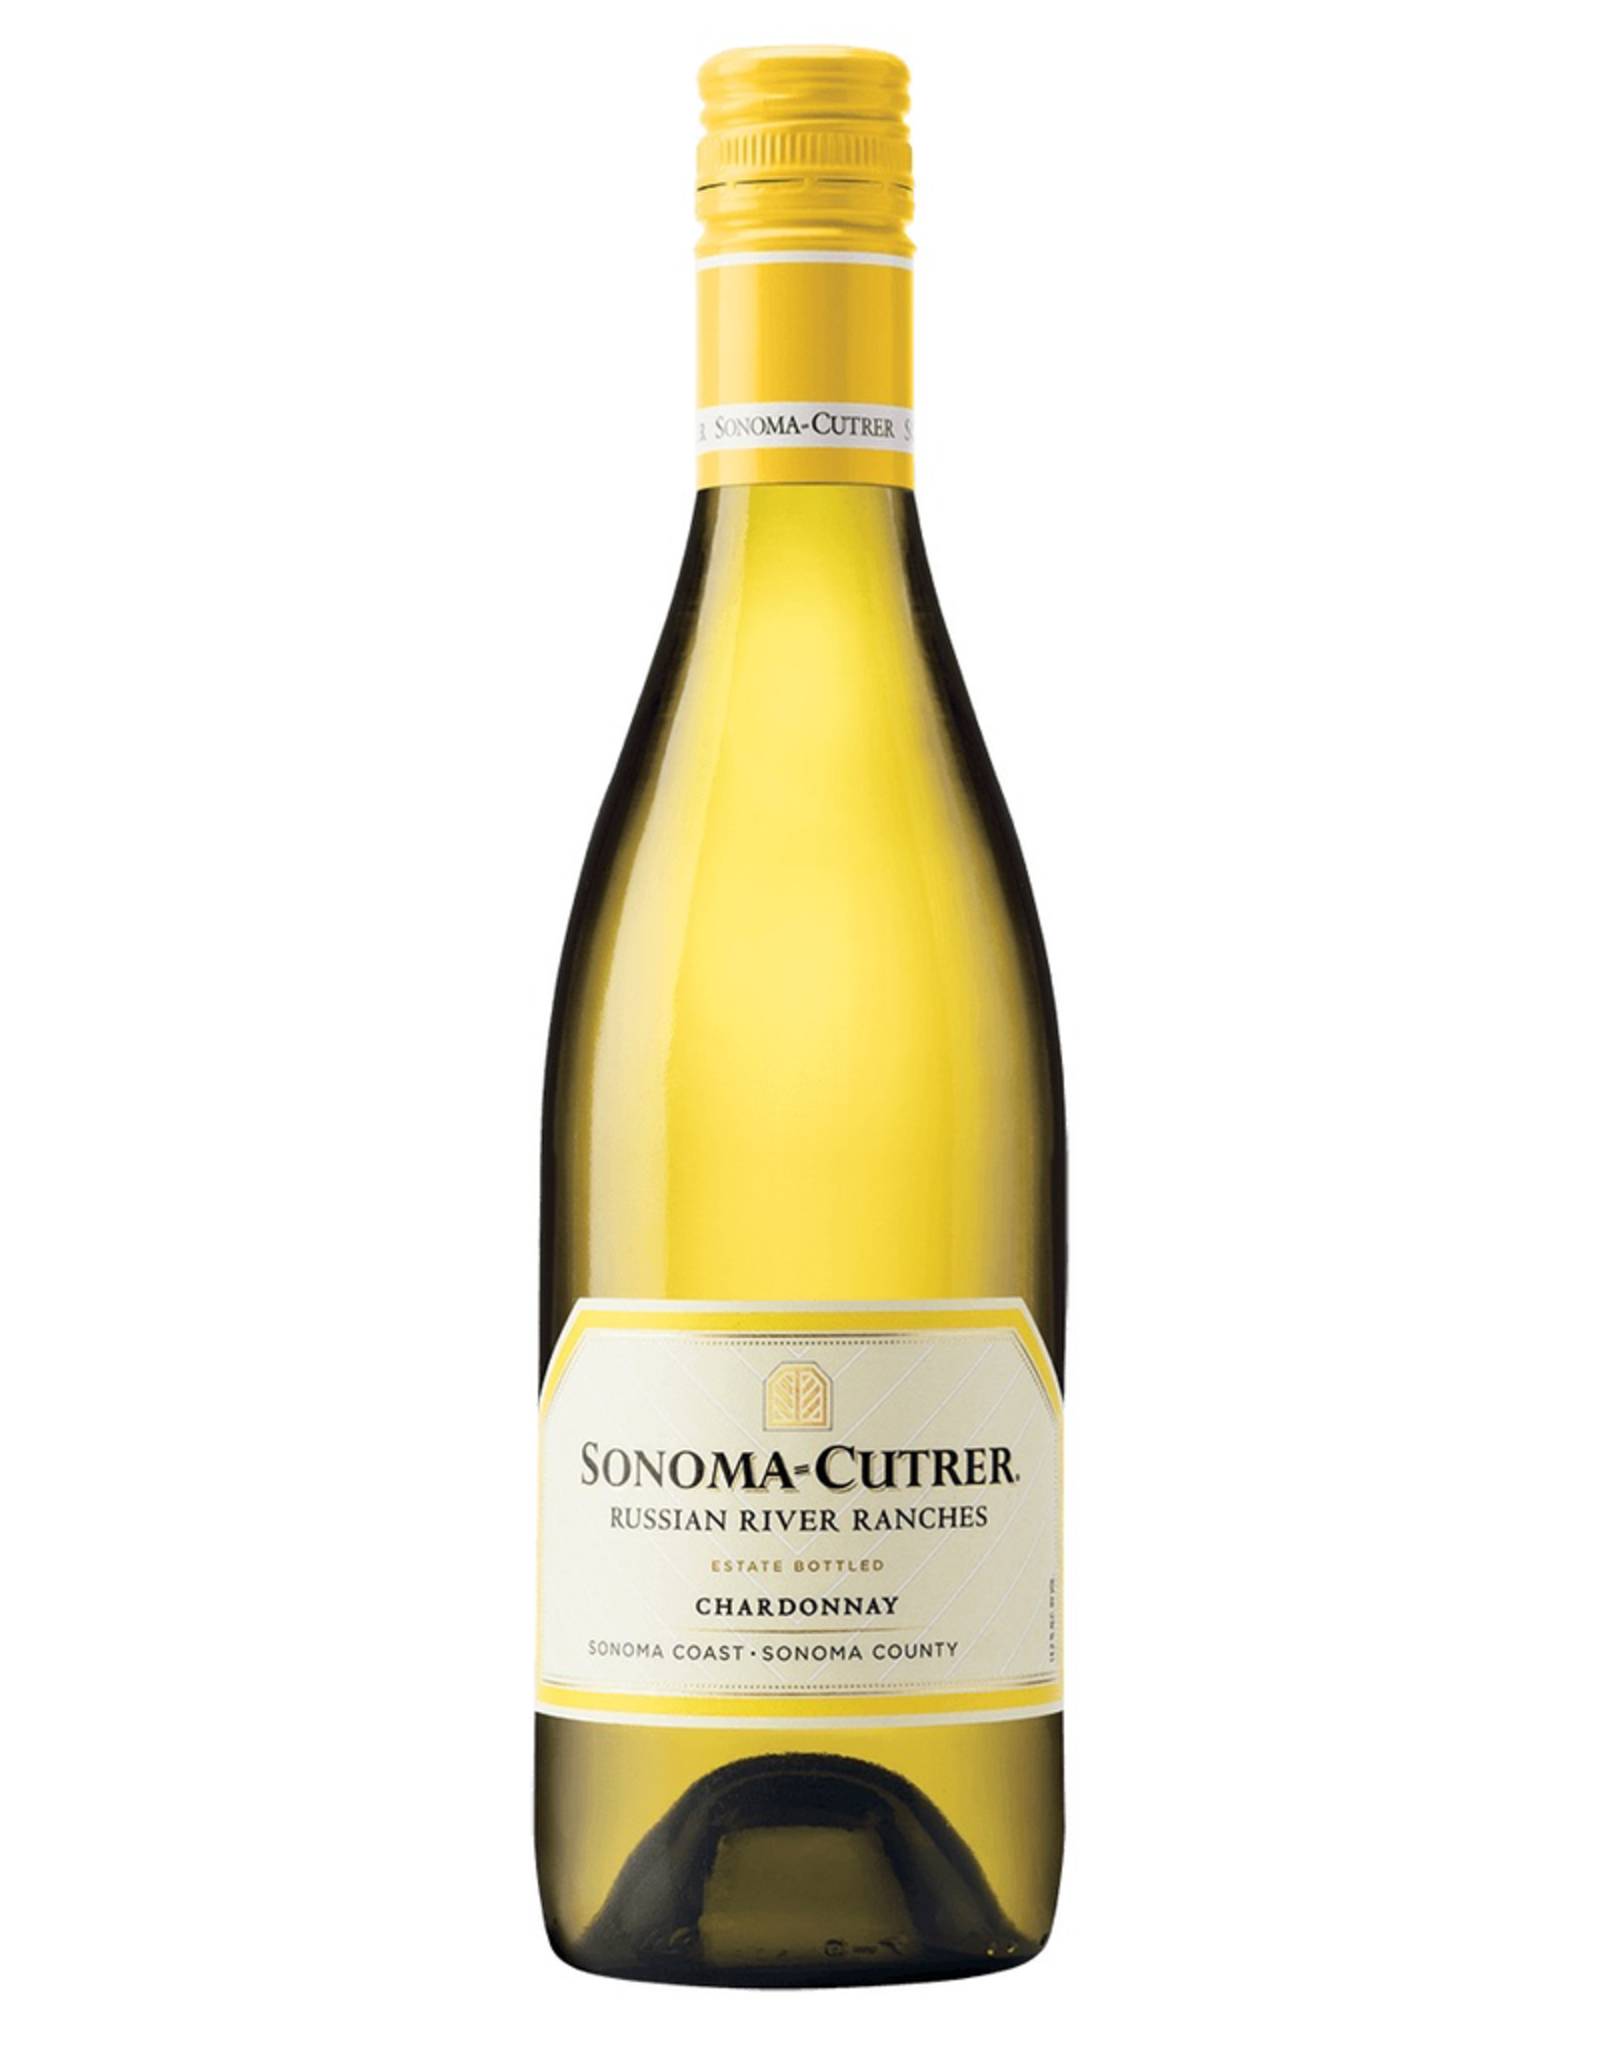 White Wine 2017, Sonoma-Cutrer, Chardonnay, Sonoma, California, USA, 14% Alc., CTnr, TW90